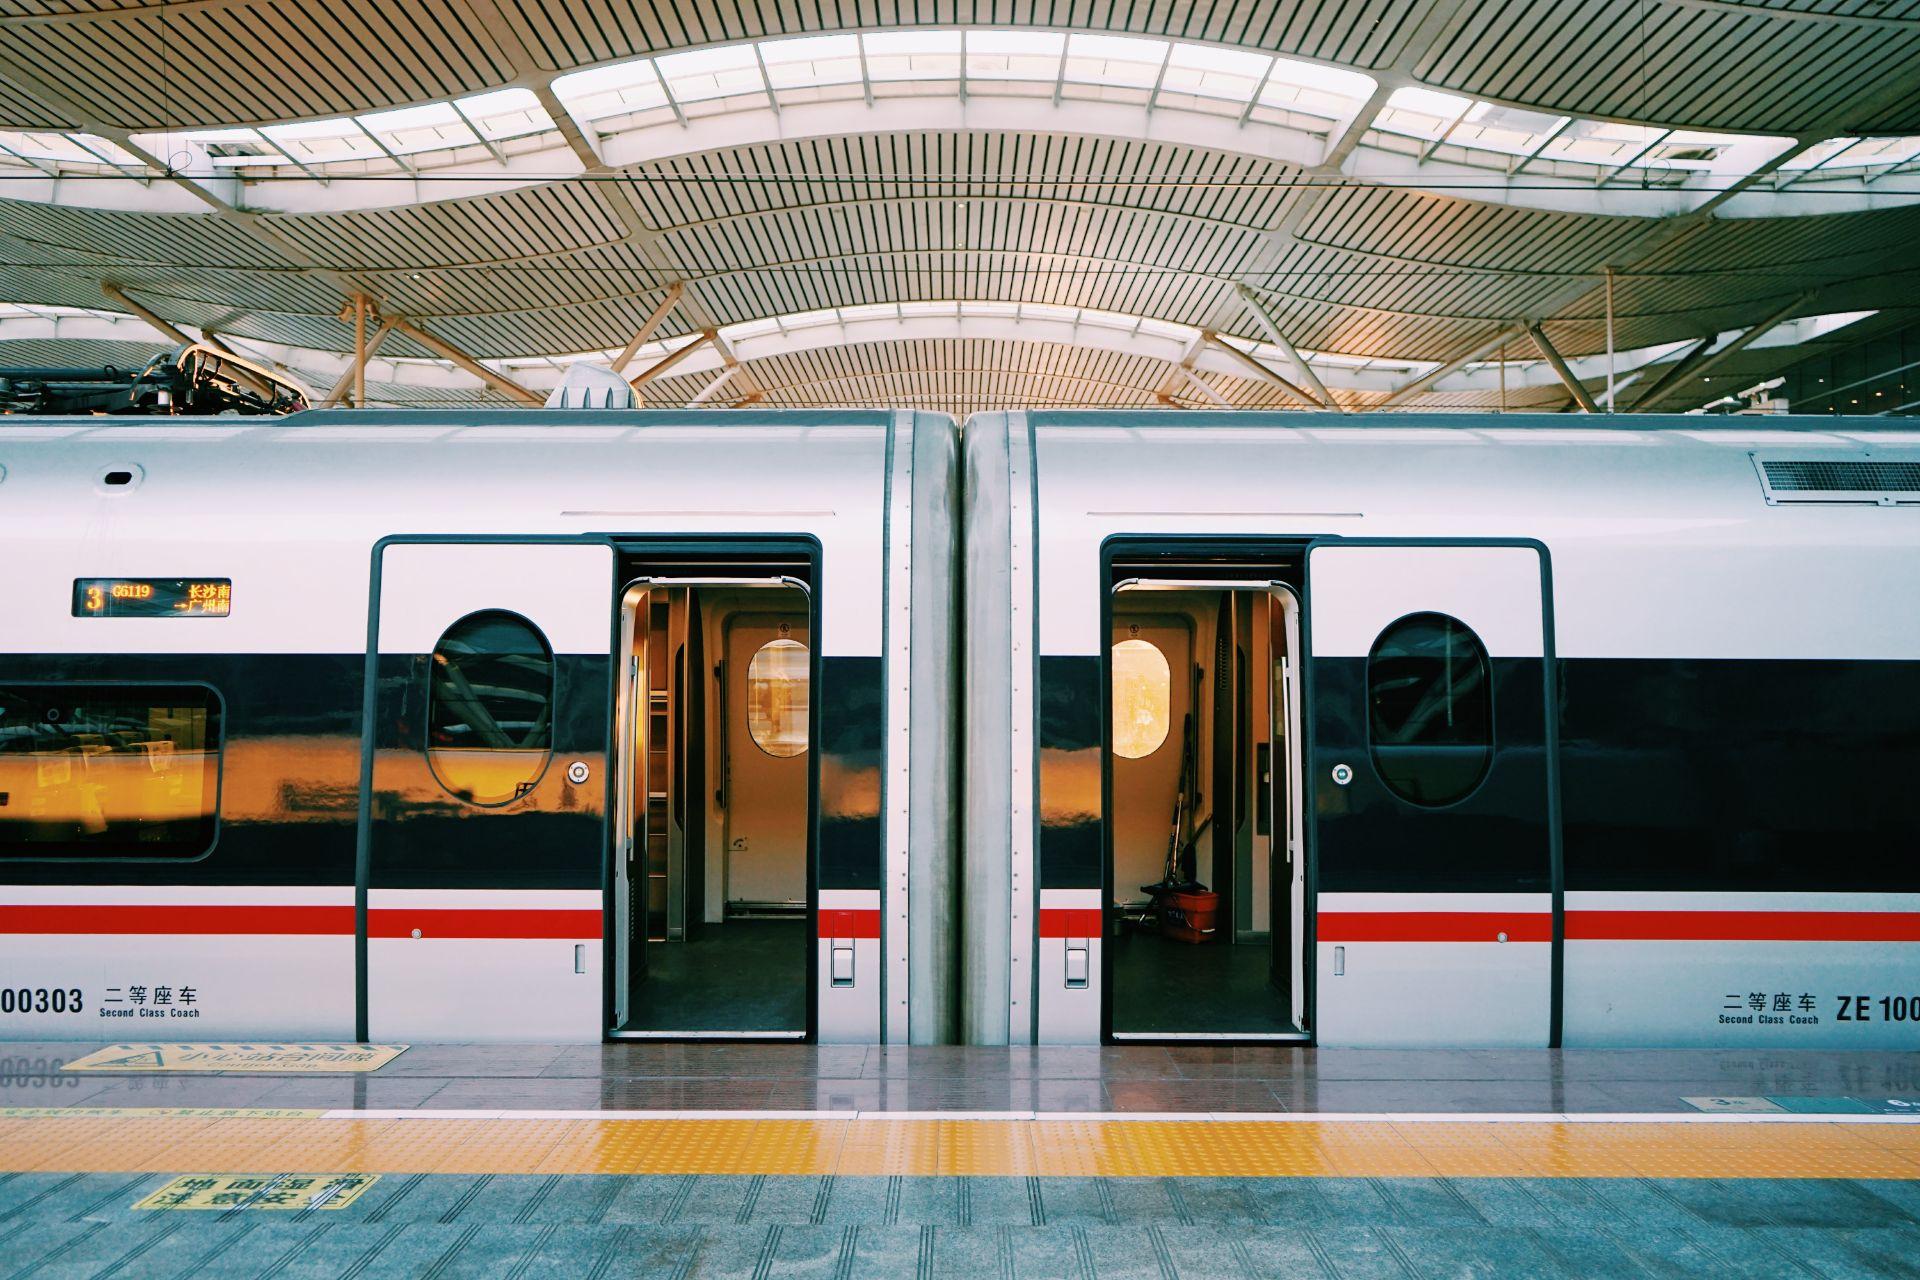 train-in-europe-with-doors-open-at-platform-interrailing-interrail